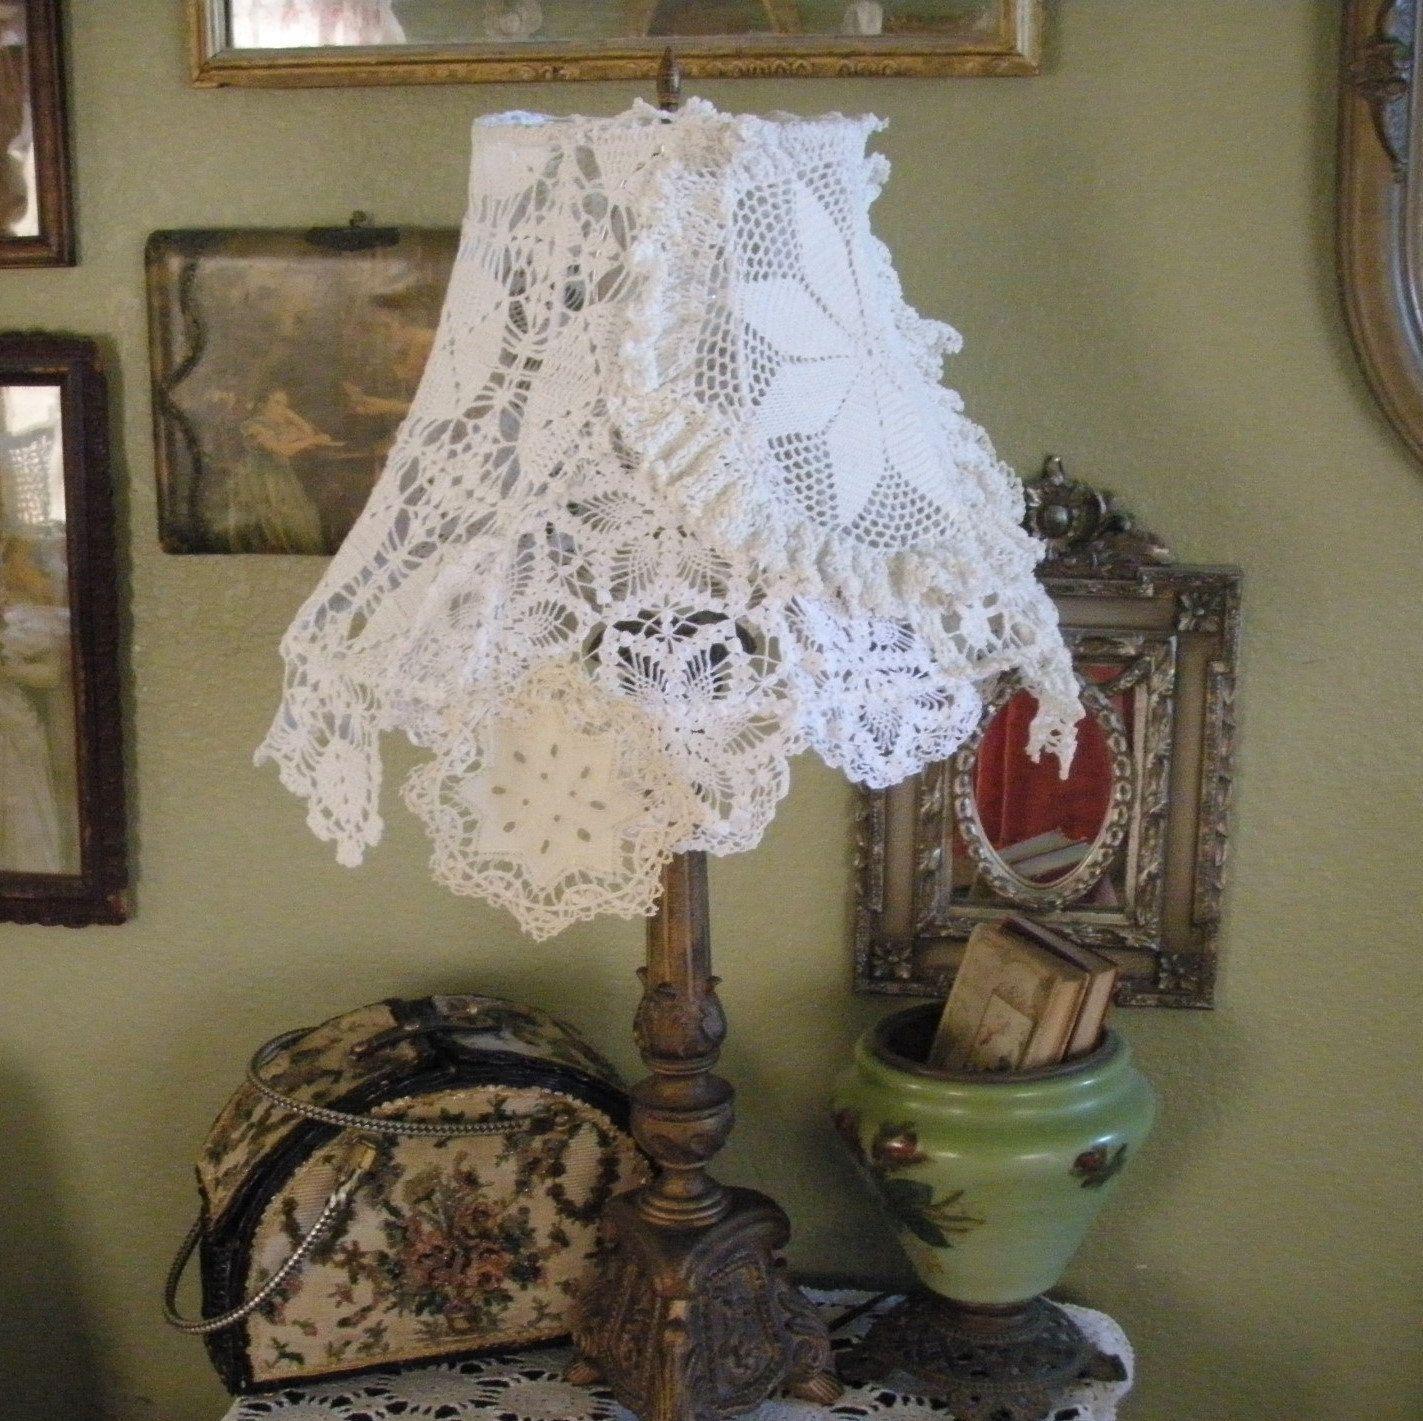 Doilies Lamp Shade - Lace. (Sort of fru-fru)